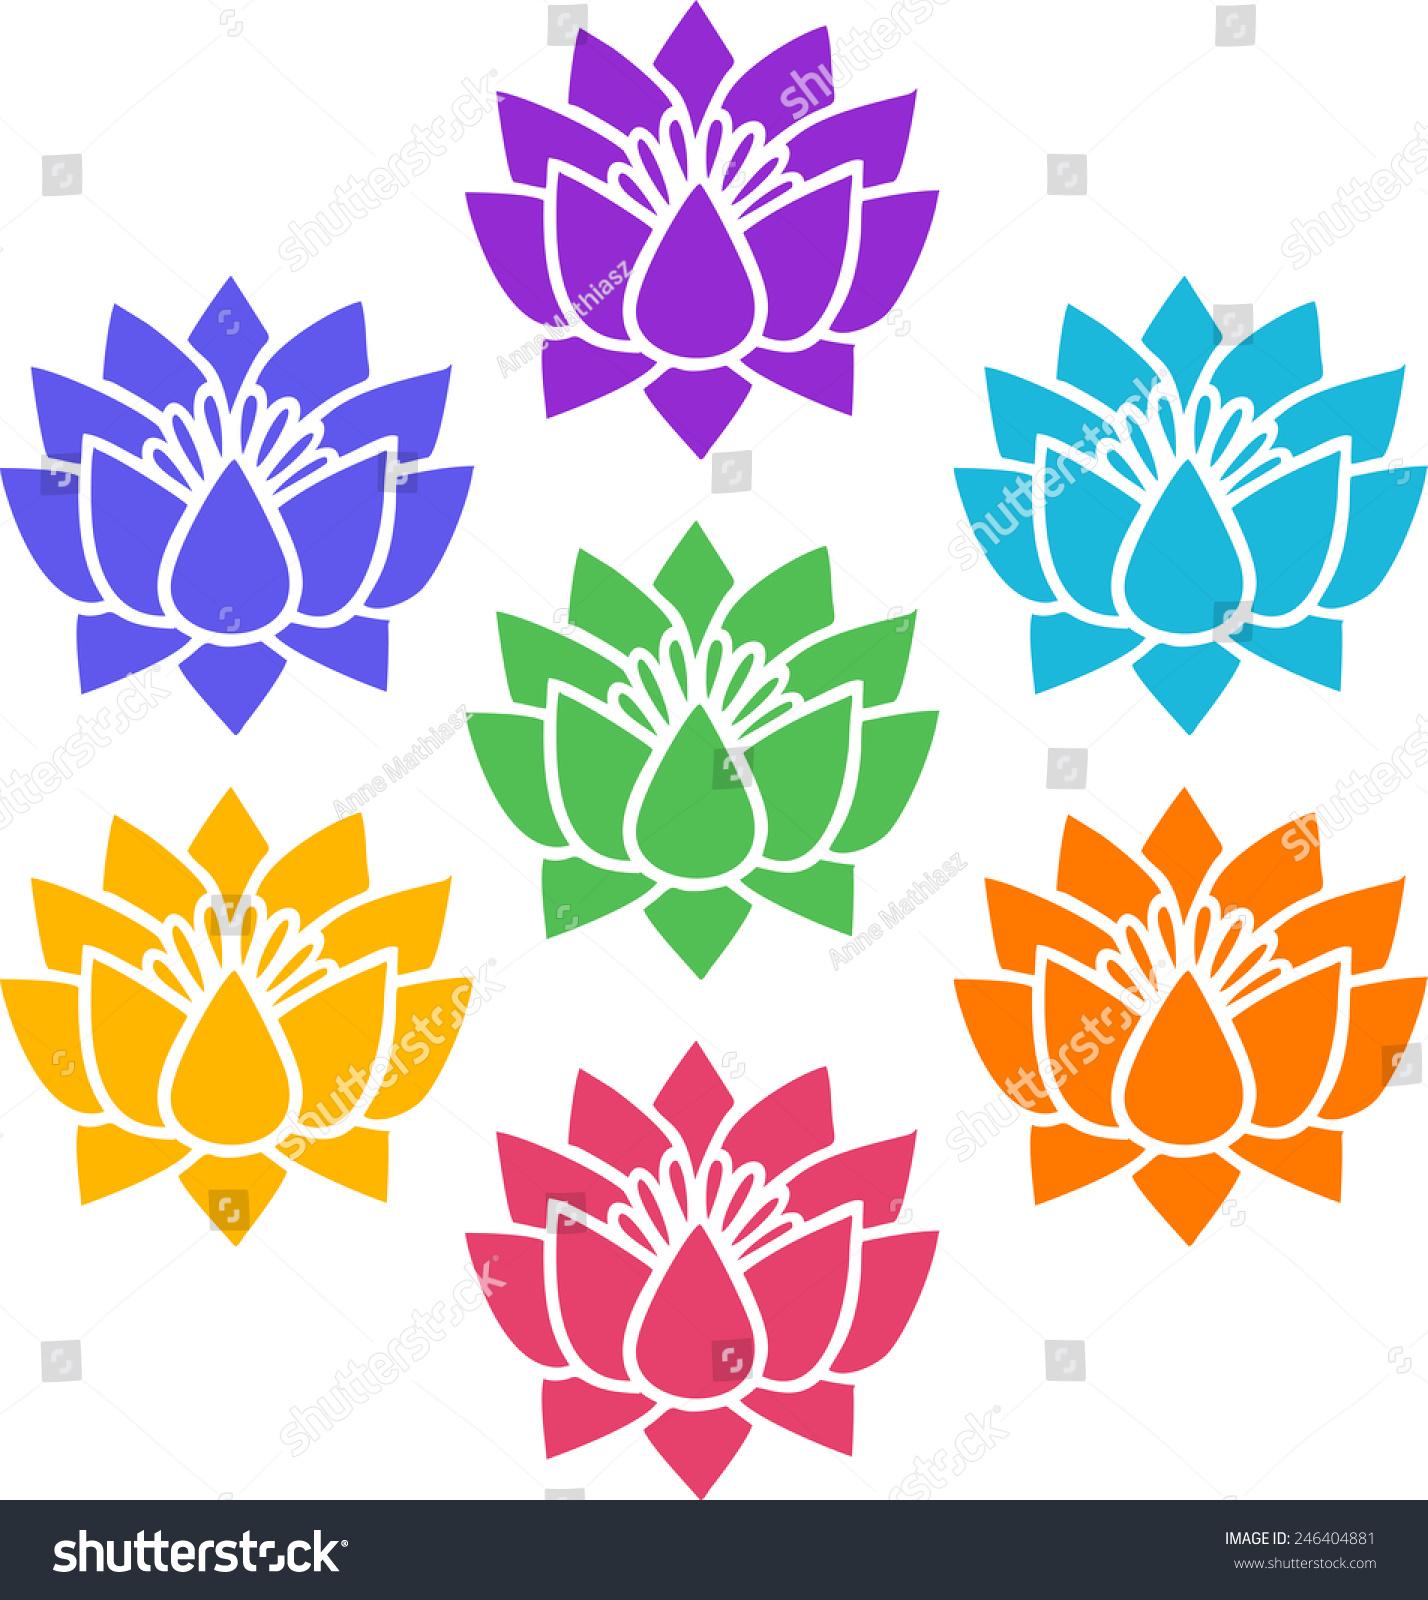 7 Chakras Lotus Flowers Cosmic Energy Stock Vector Royalty Free